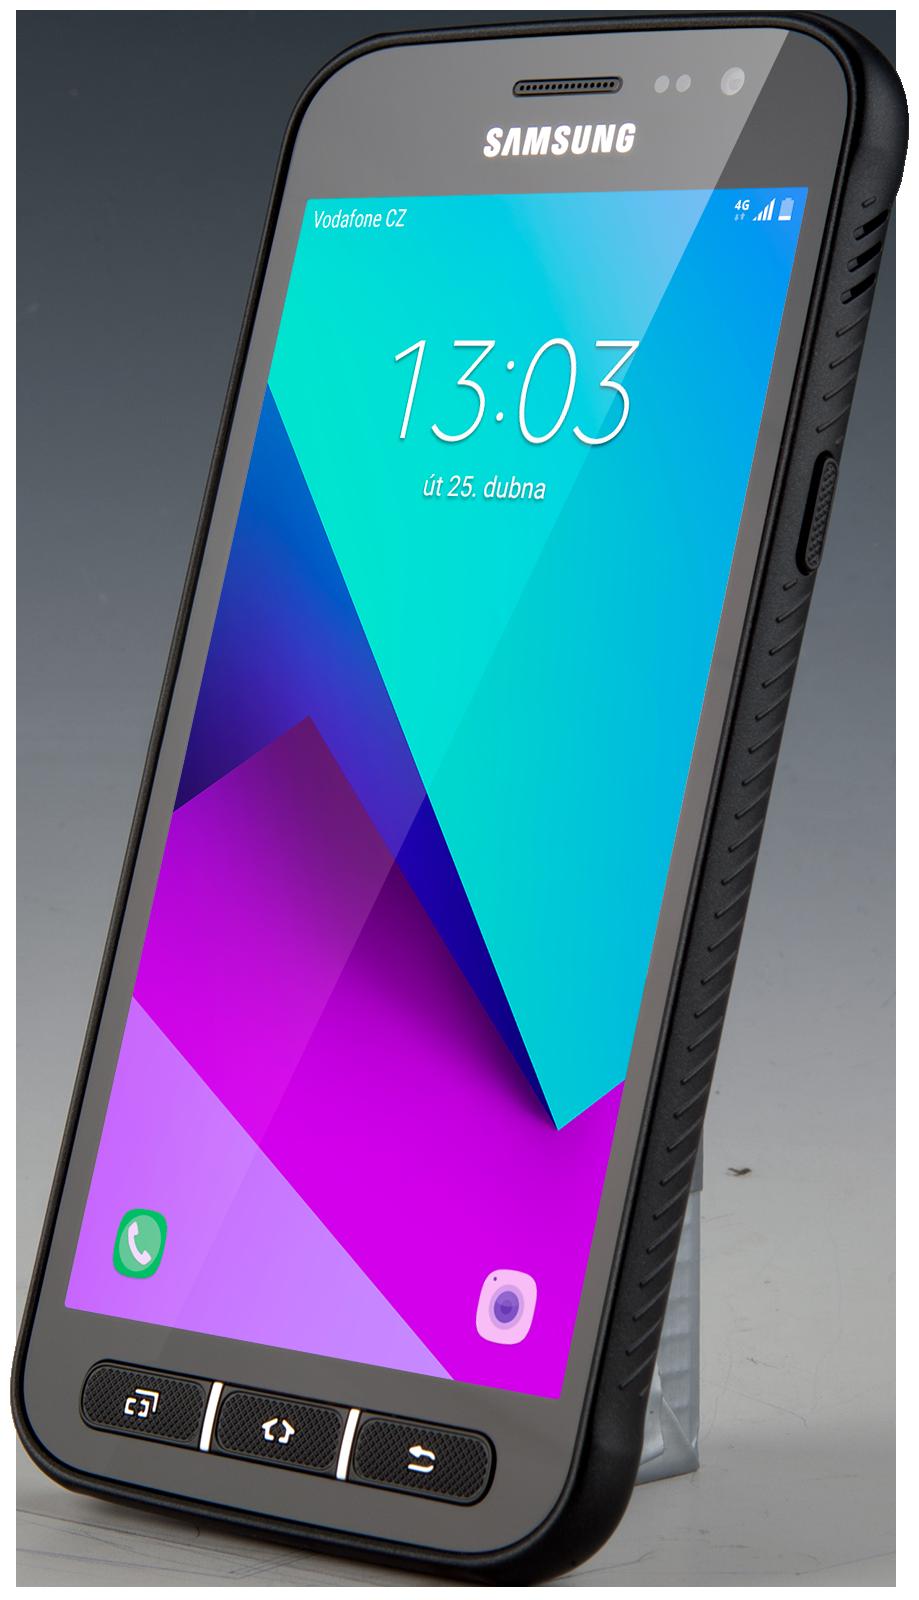 competitive price 89a23 b3215 Telefon Samsung Galaxy XCover 4 - Vodafone.cz